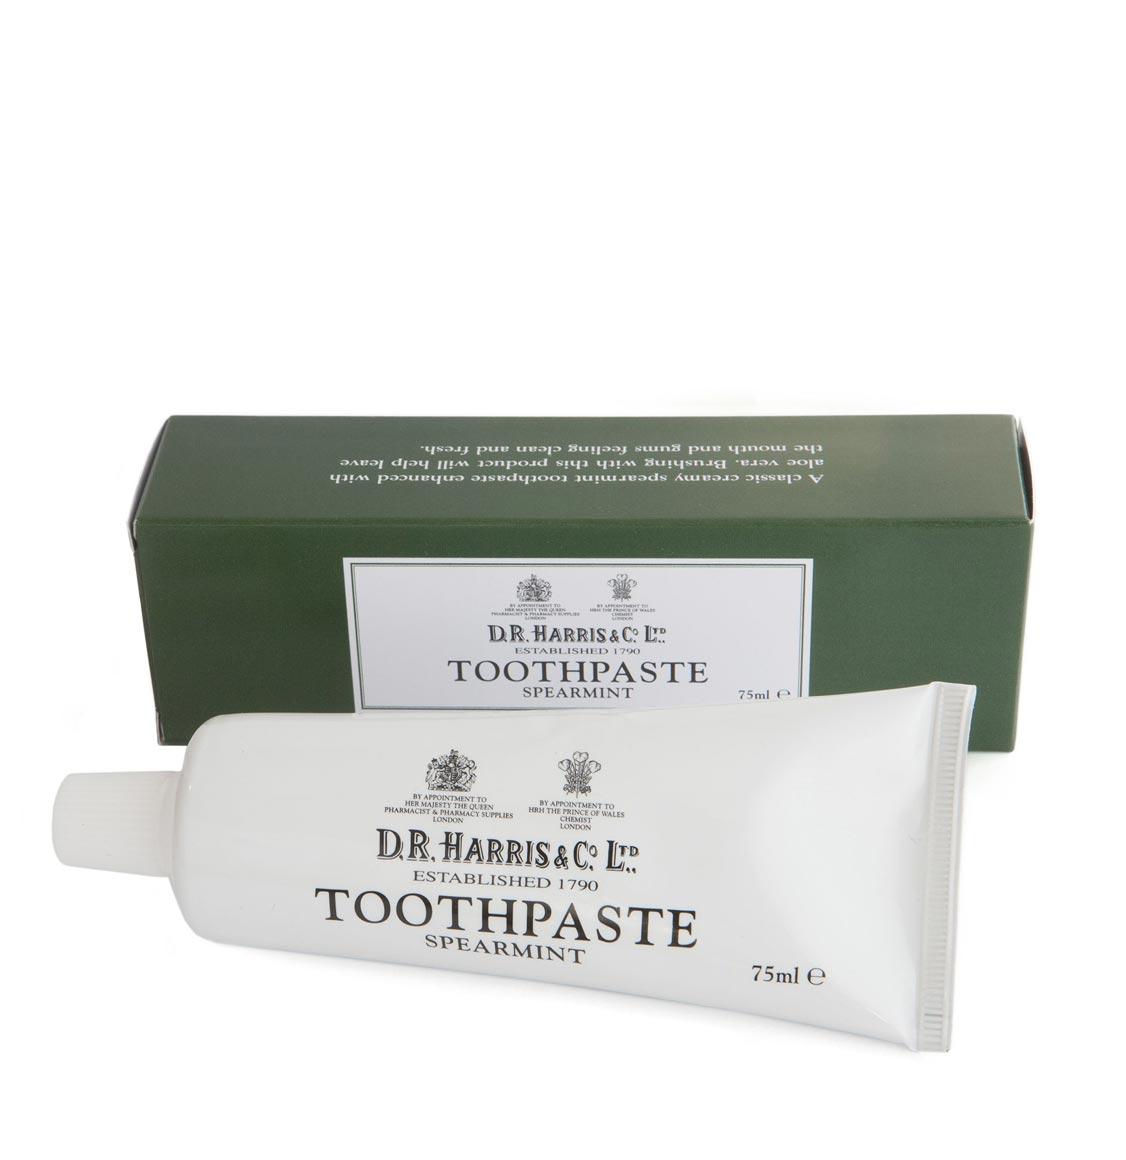 D R Harris Spearmint Toothpaste 75ml